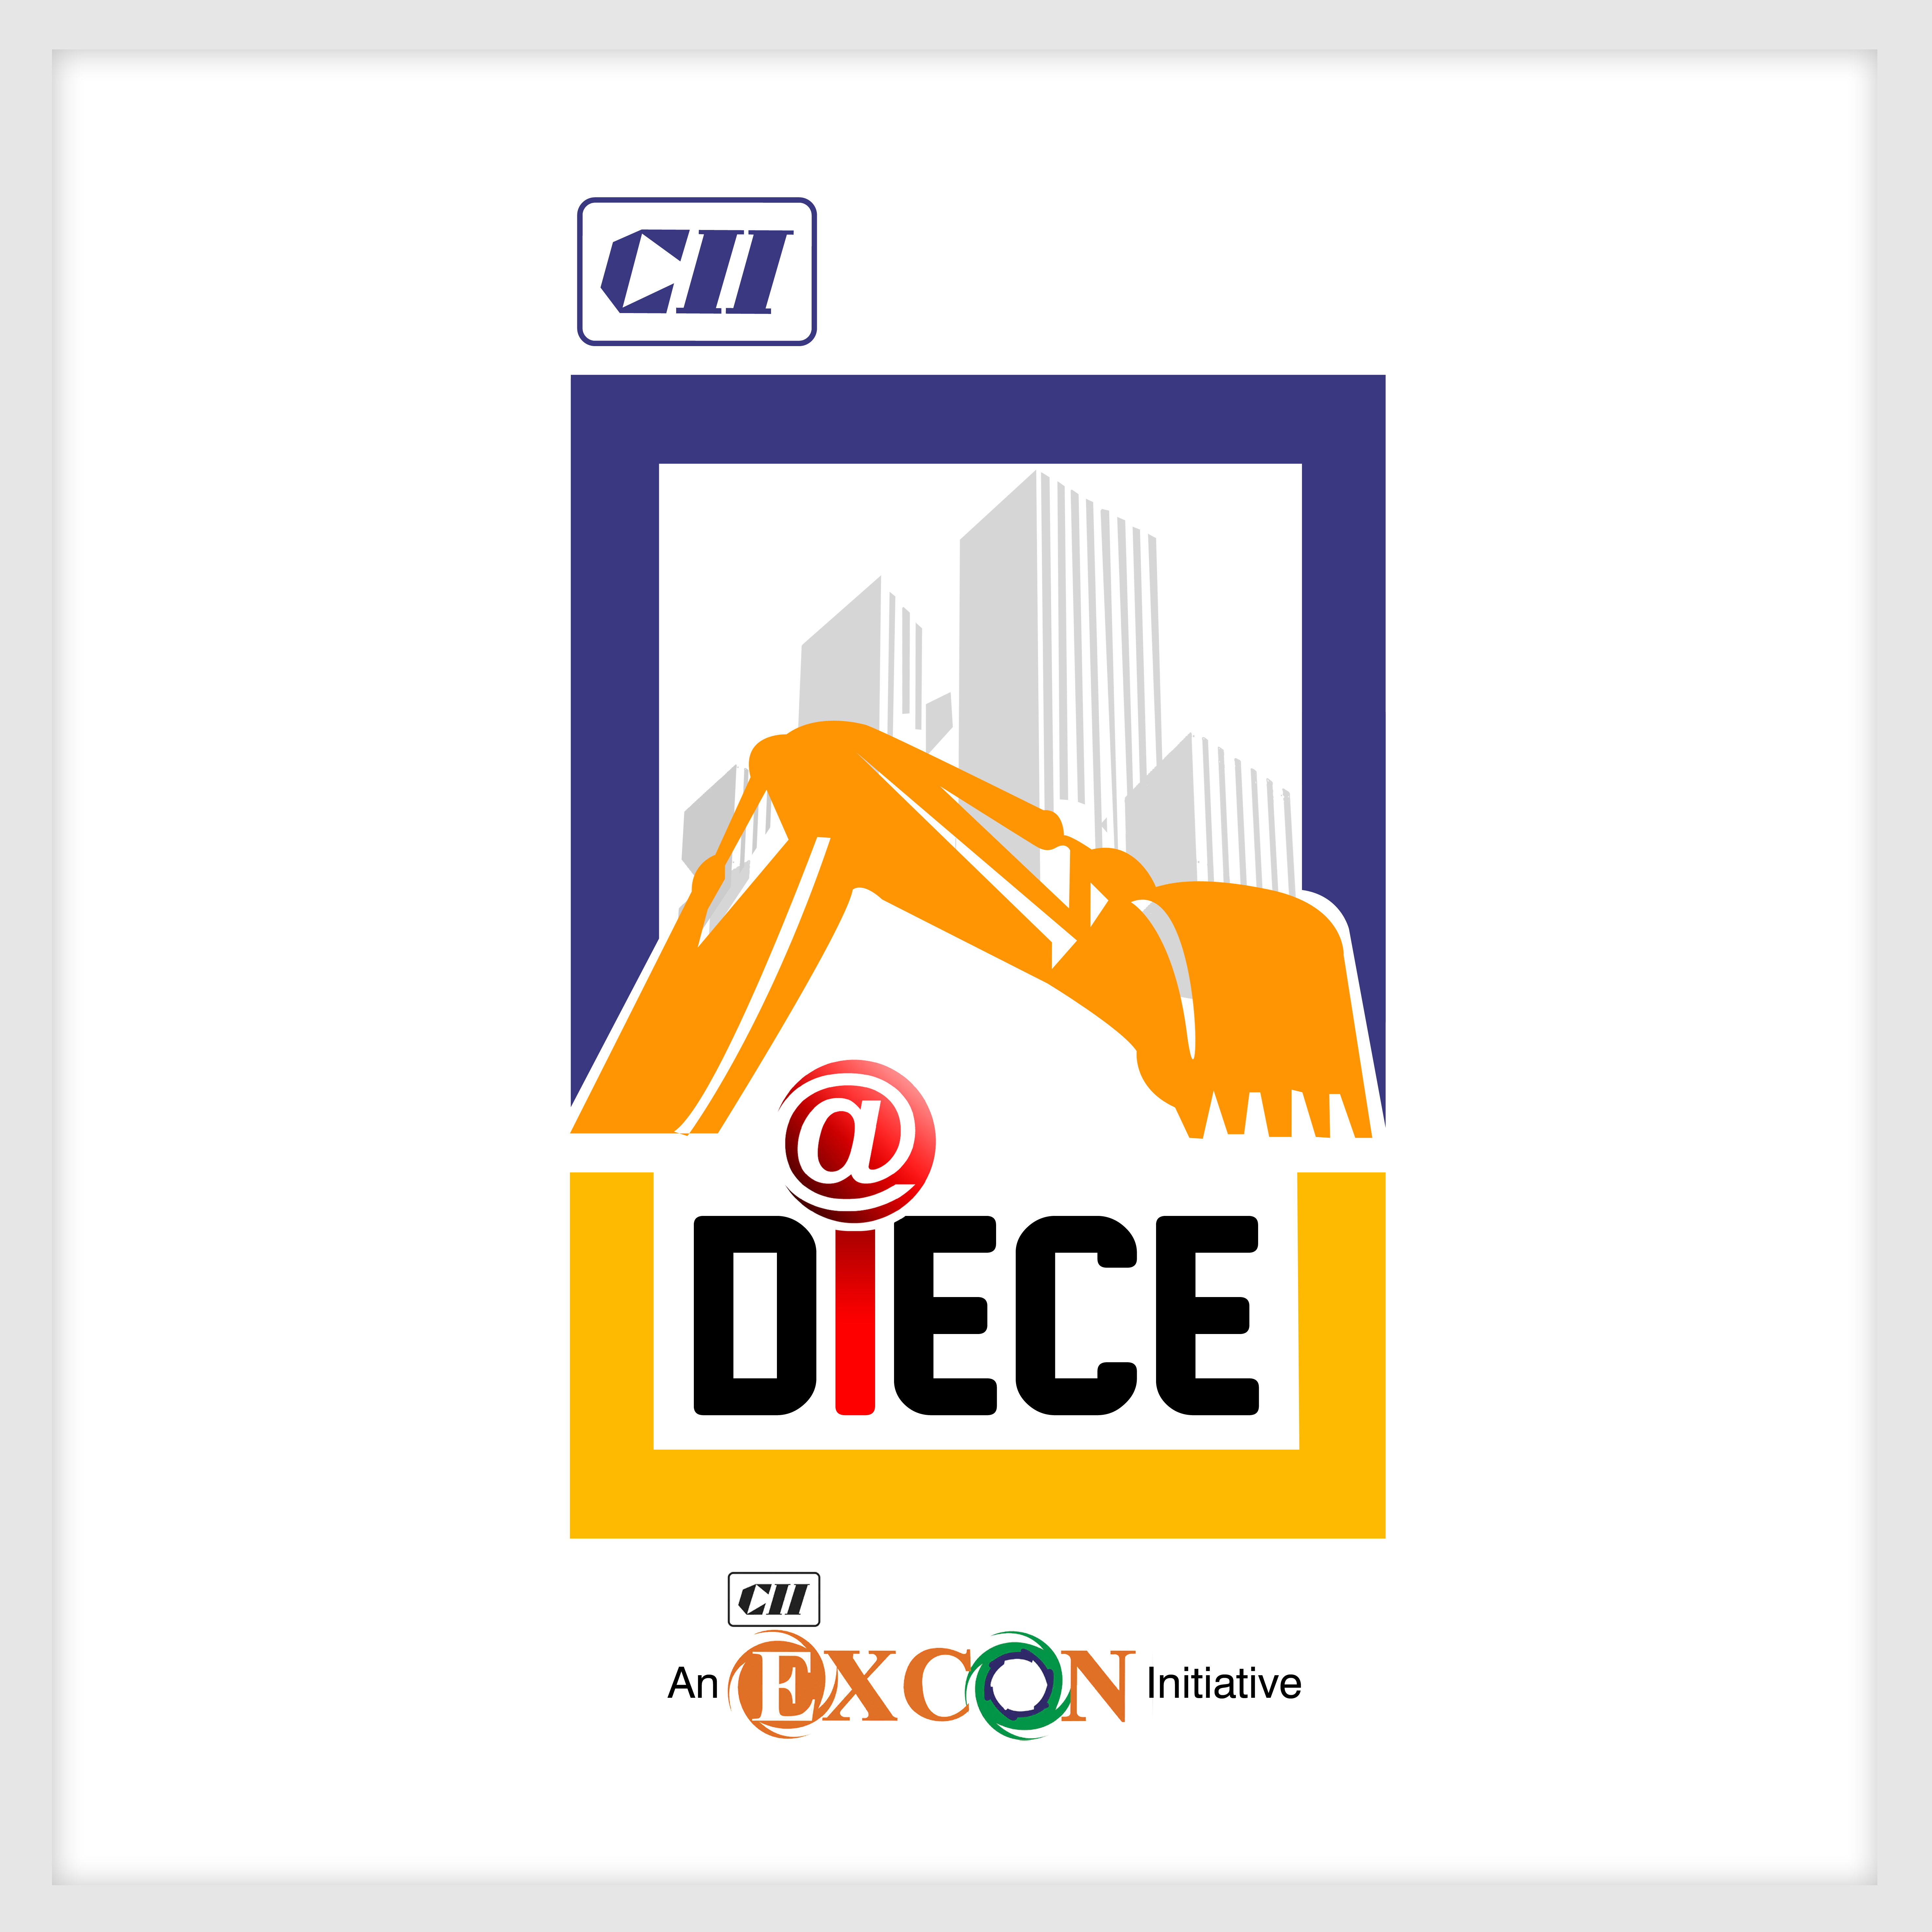 CII DiECE